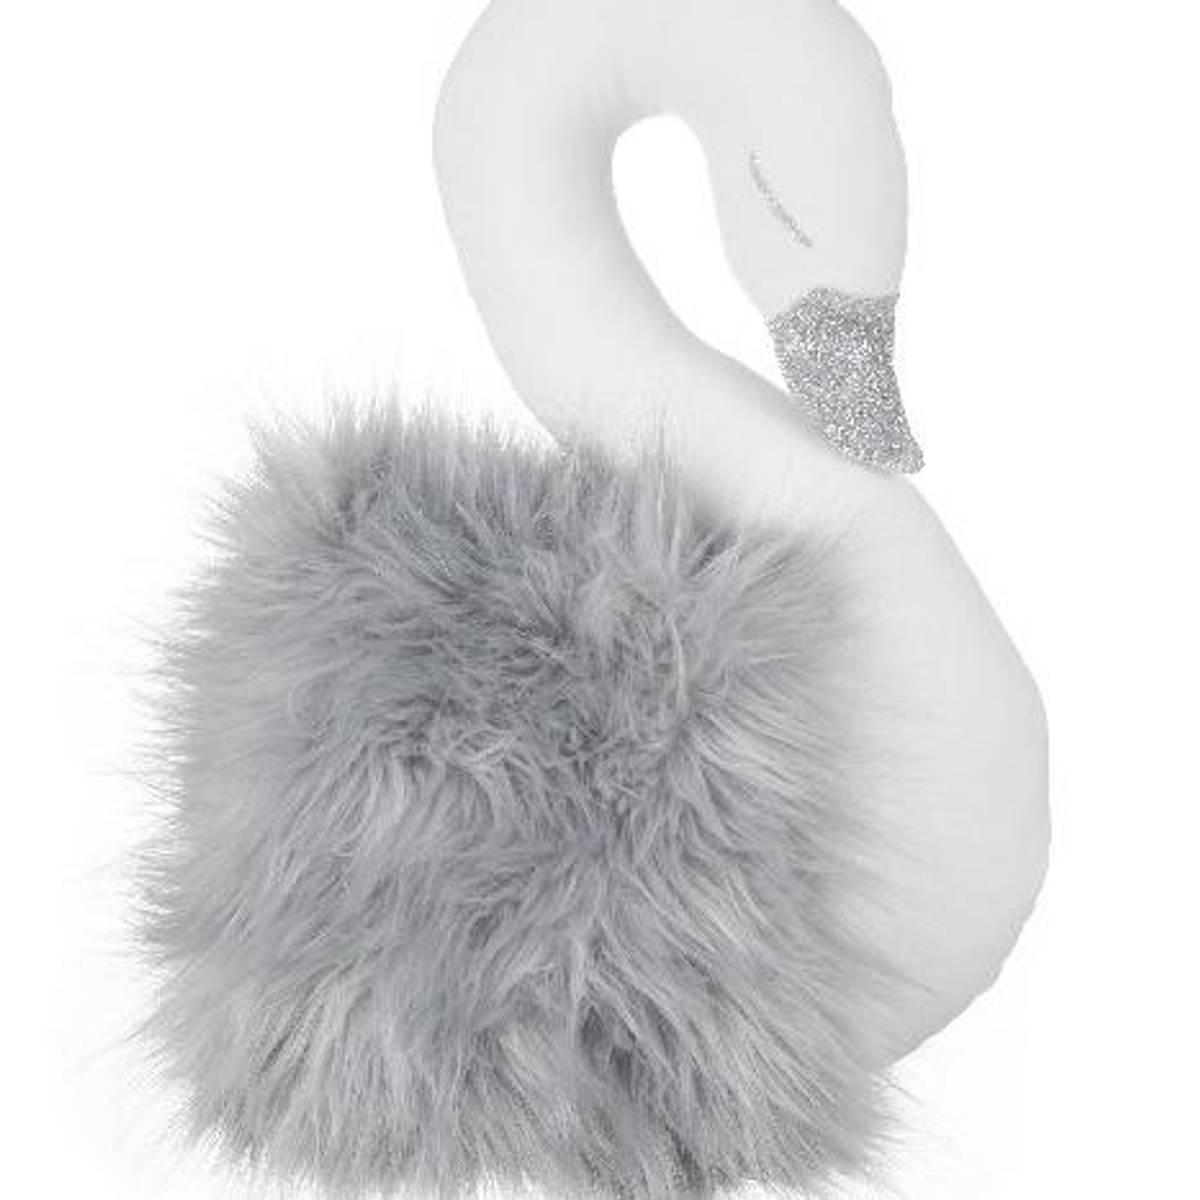 Hvit svane med grå pels, veggdekor fra Cotton & Sweets